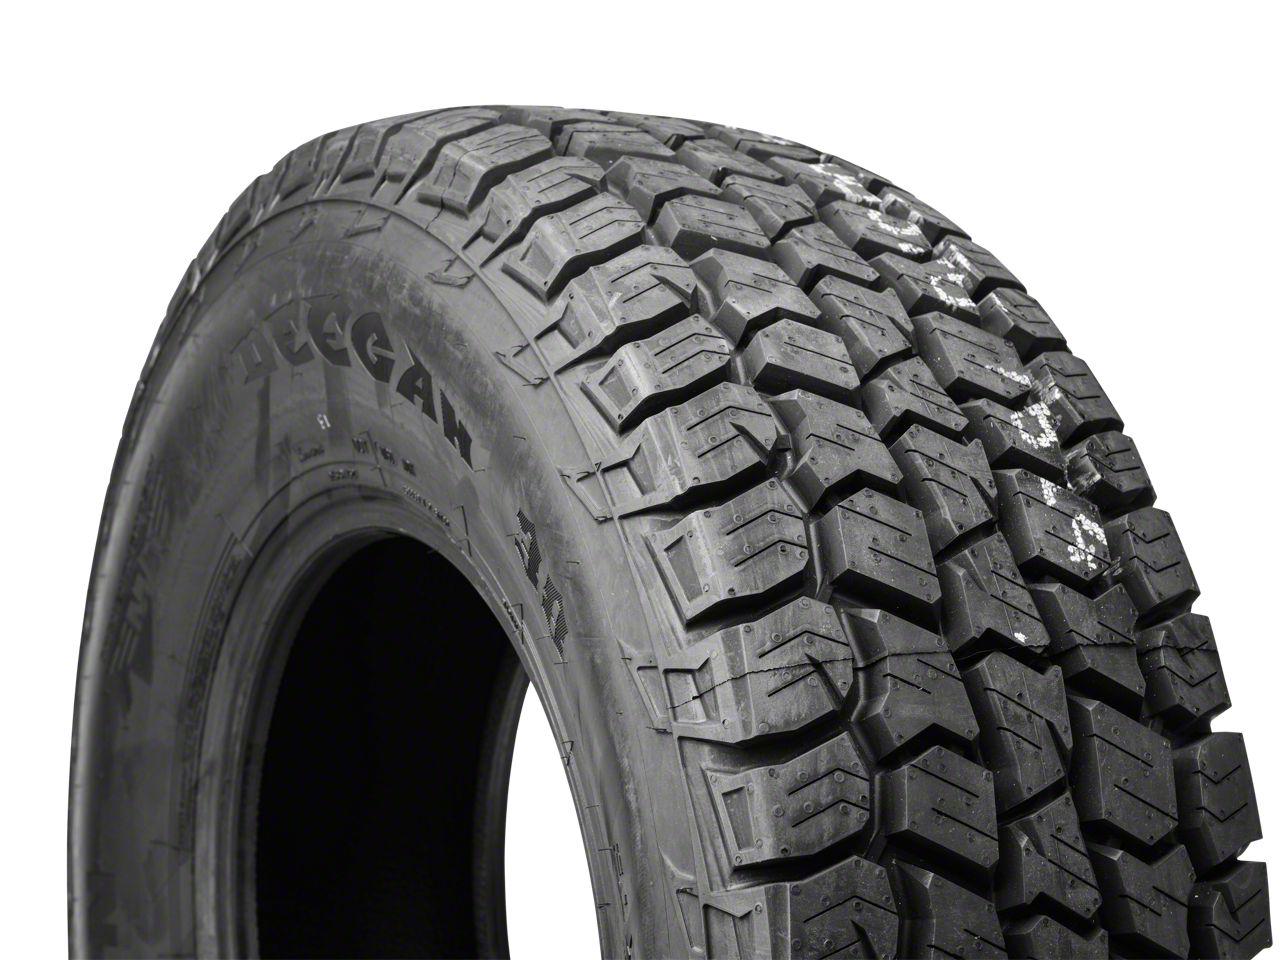 Mickey Thompson Deegan 38 All -Terrain Tire - 31X10.50R15